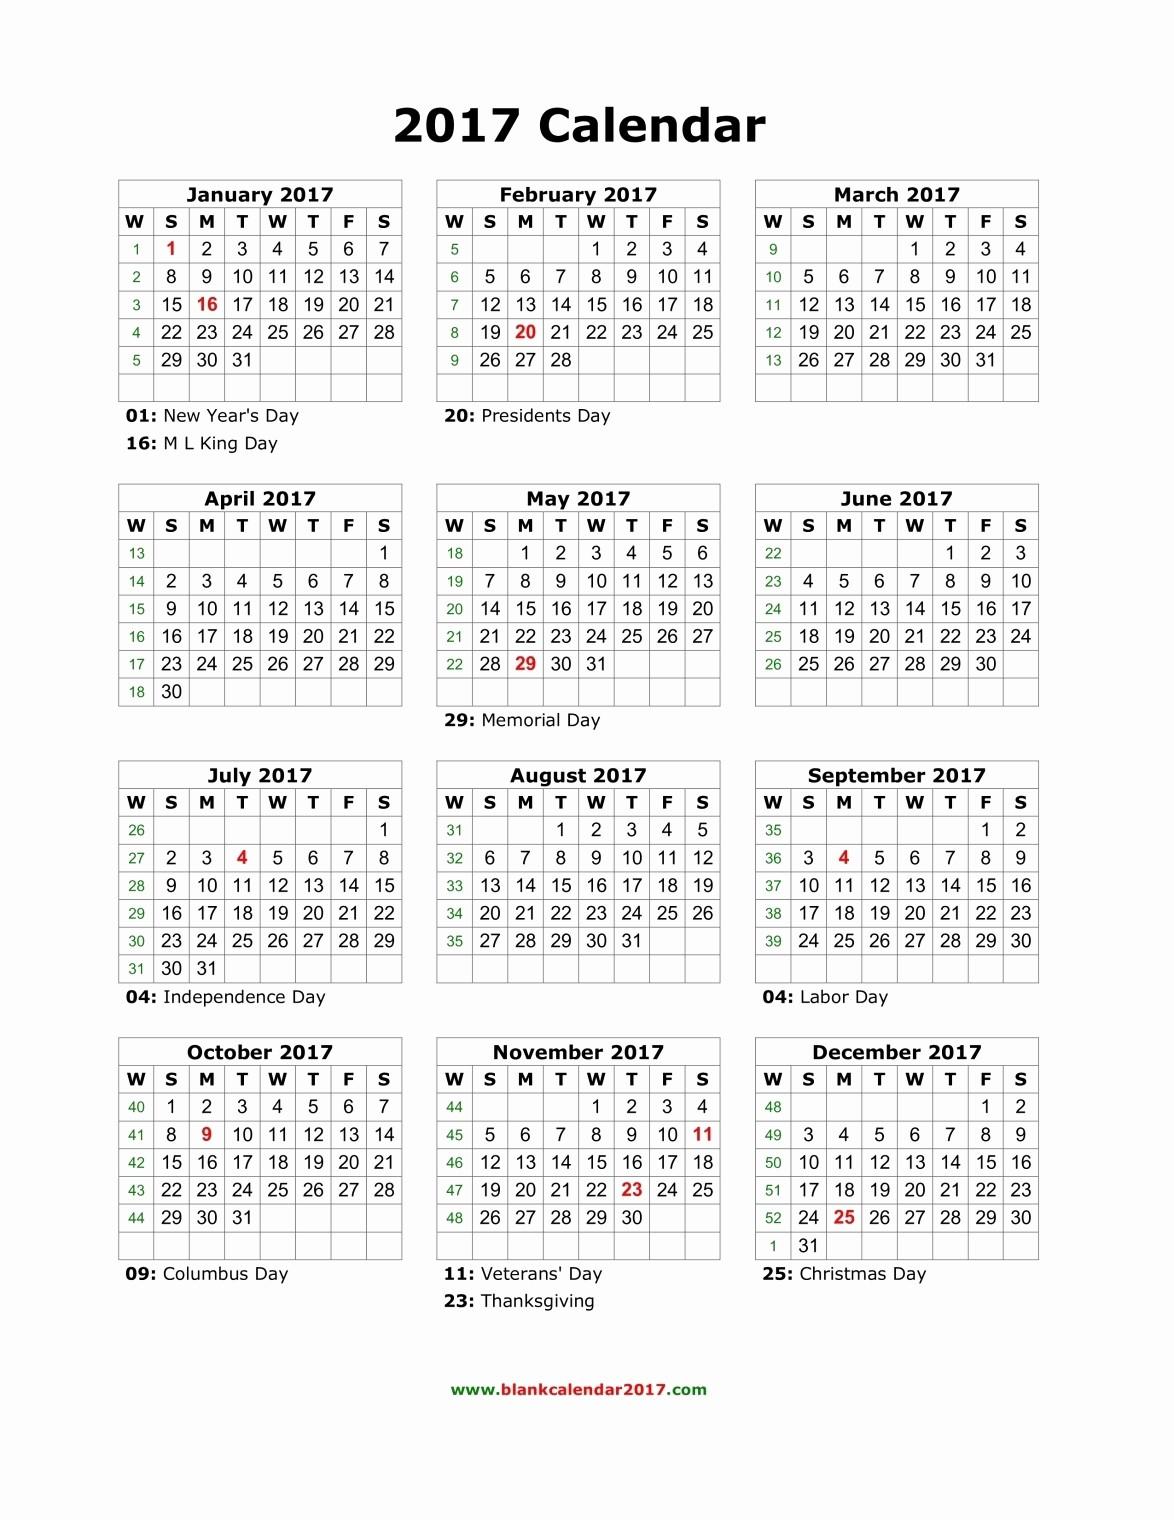 2017 Calendar with Holidays Template Elegant Blank Calendar 2017